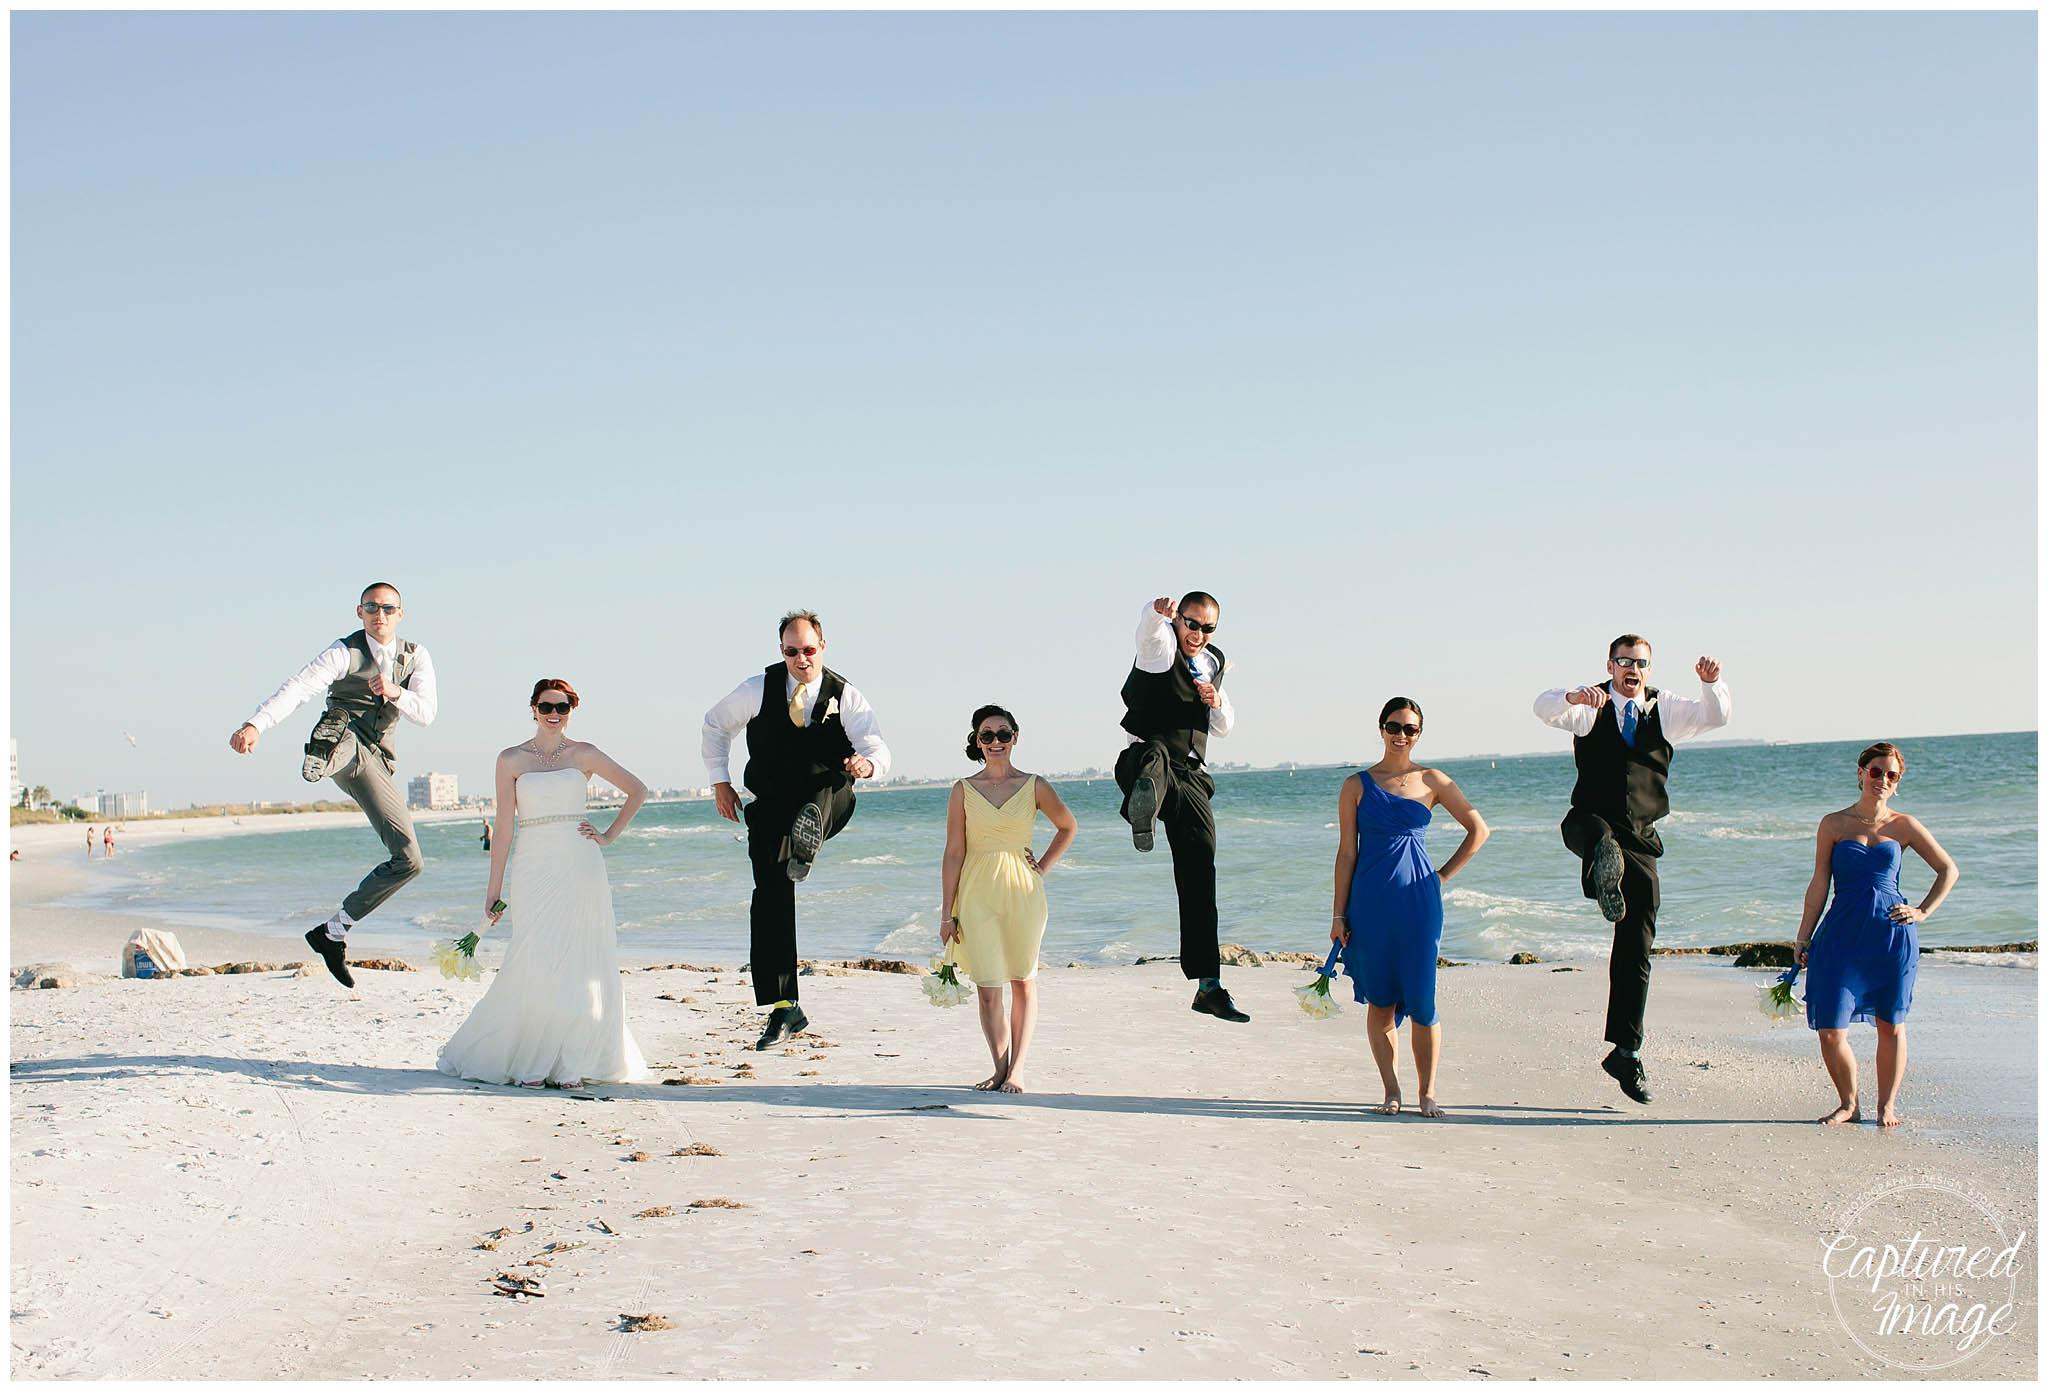 St. Pete Beach Destination Wedding (17 of 81)